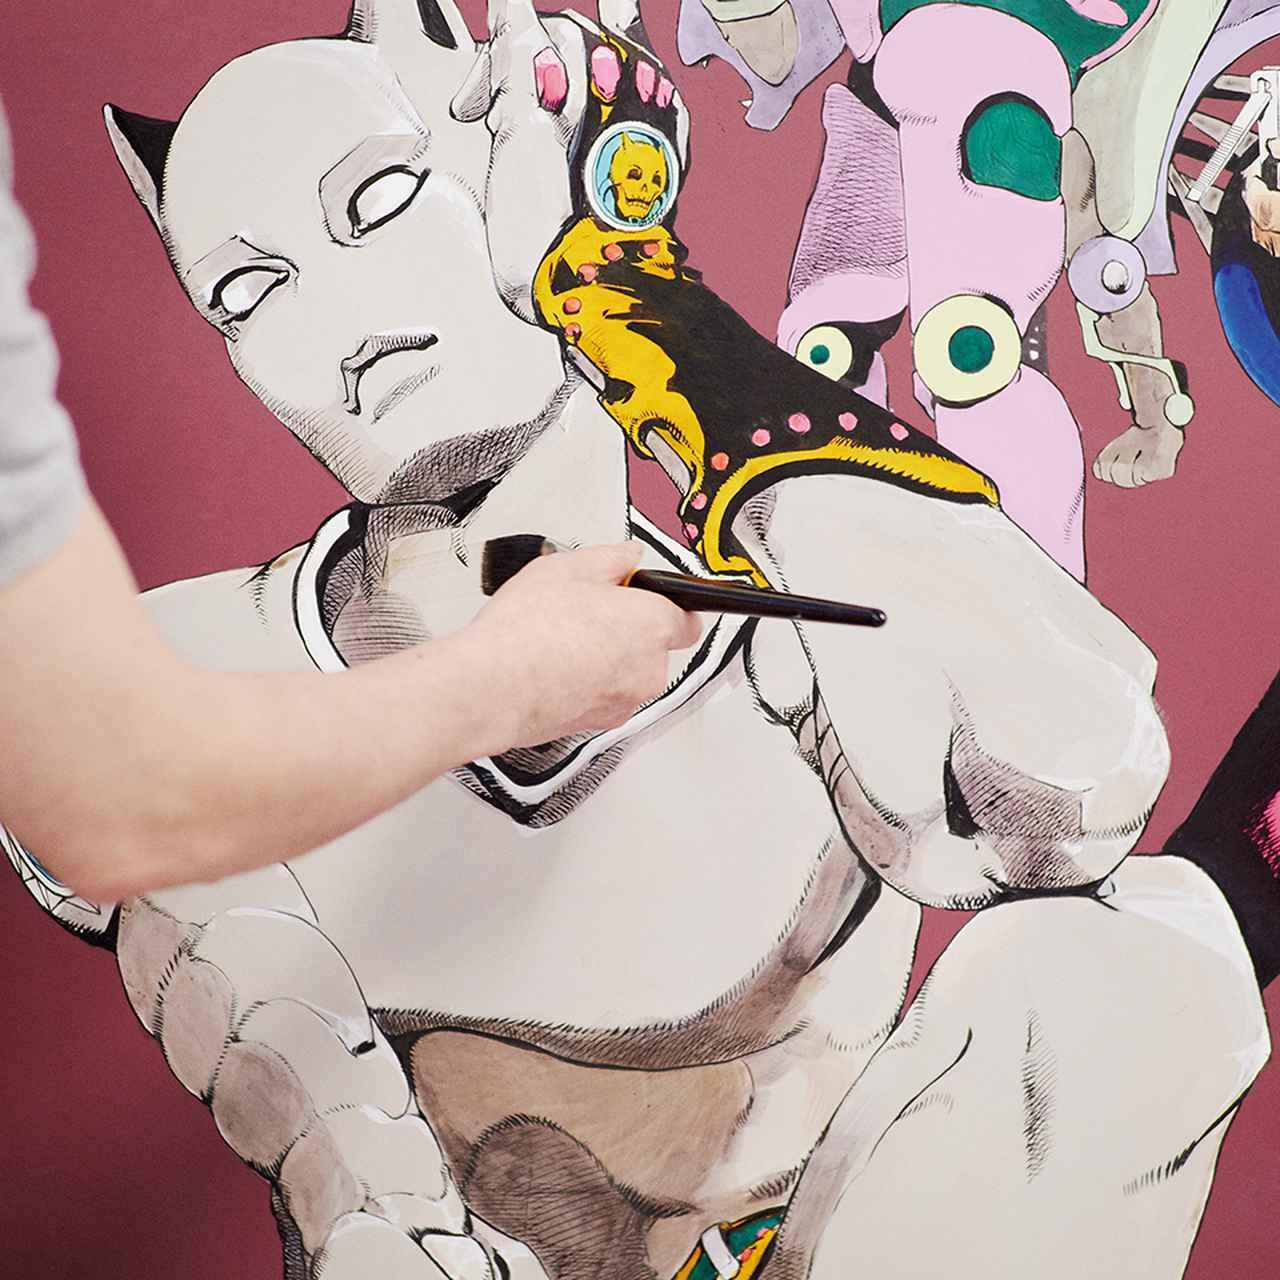 Images : 4番目の画像 - 「スペシャル インタビュー 漫画家・荒木飛呂彦の化学反応」のアルバム - T JAPAN:The New York Times Style Magazine 公式サイト